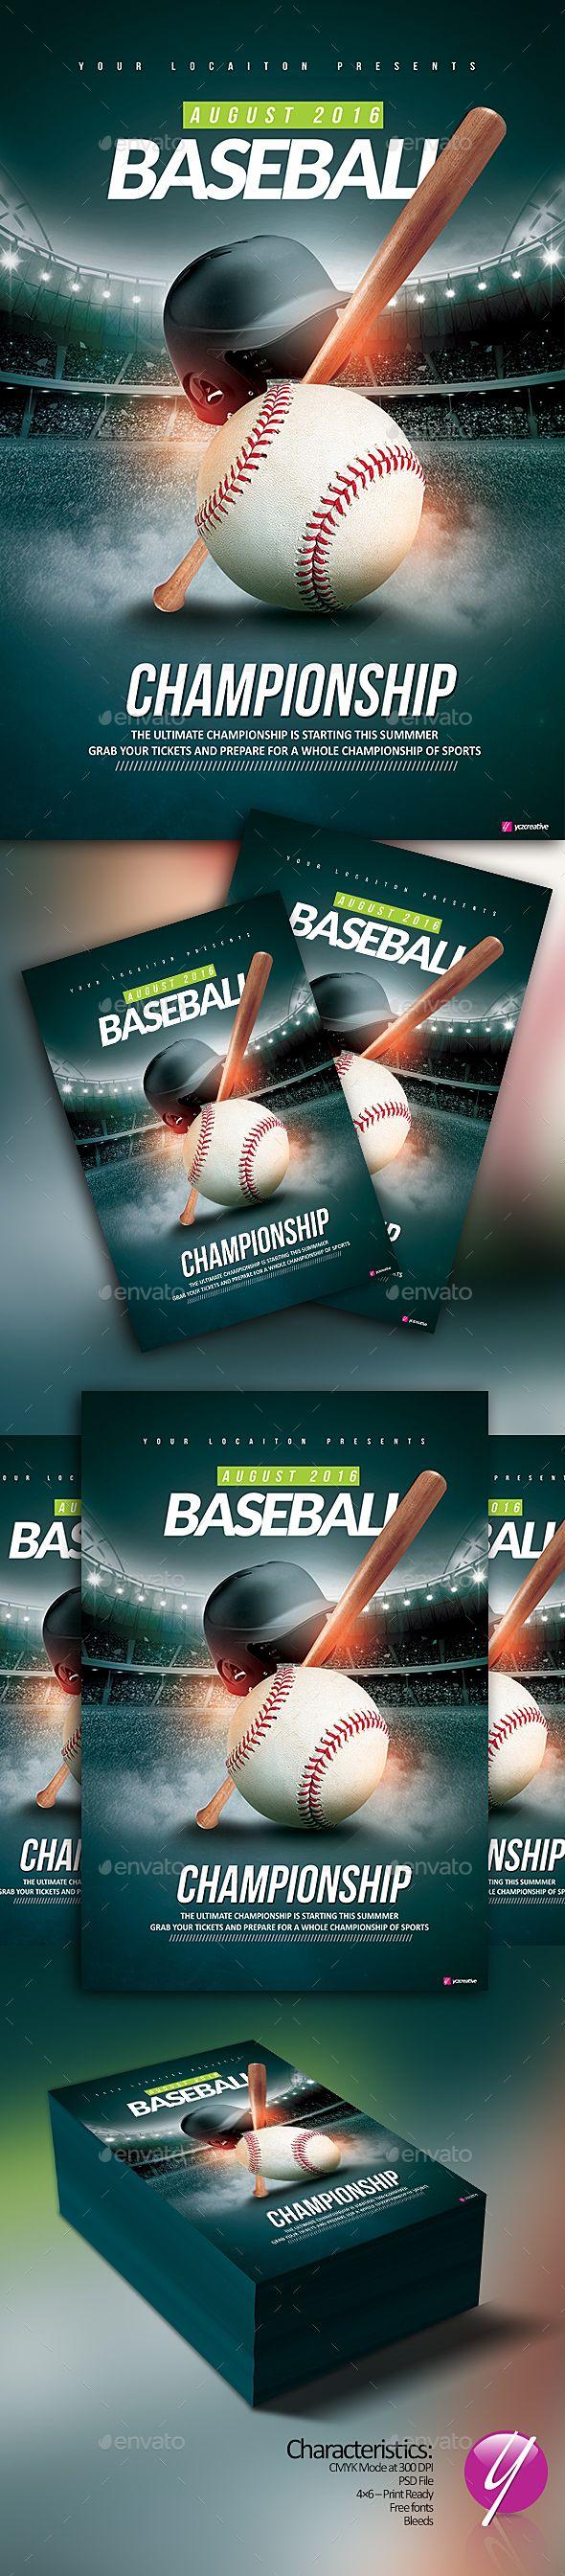 sports flyers templates sports flyers templates